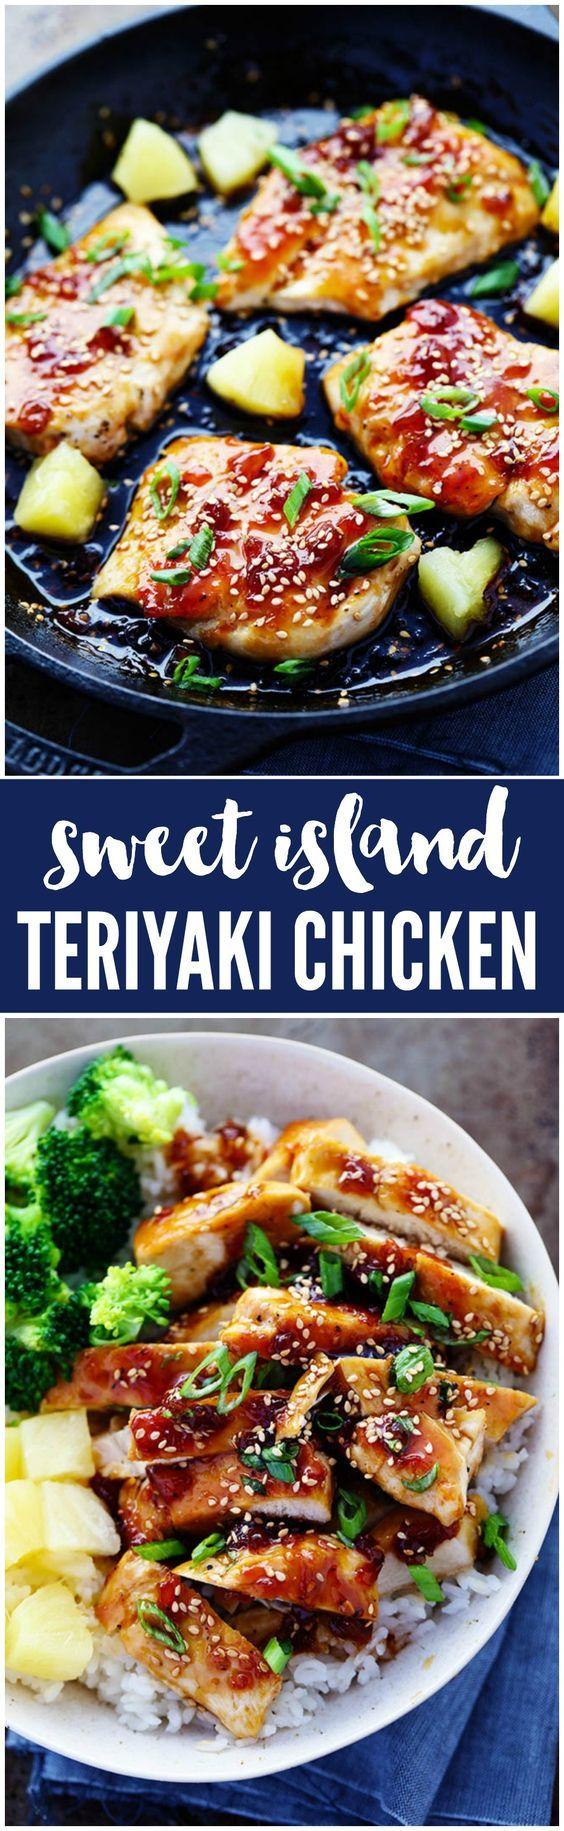 Sweet Island Teriyaki Chicken